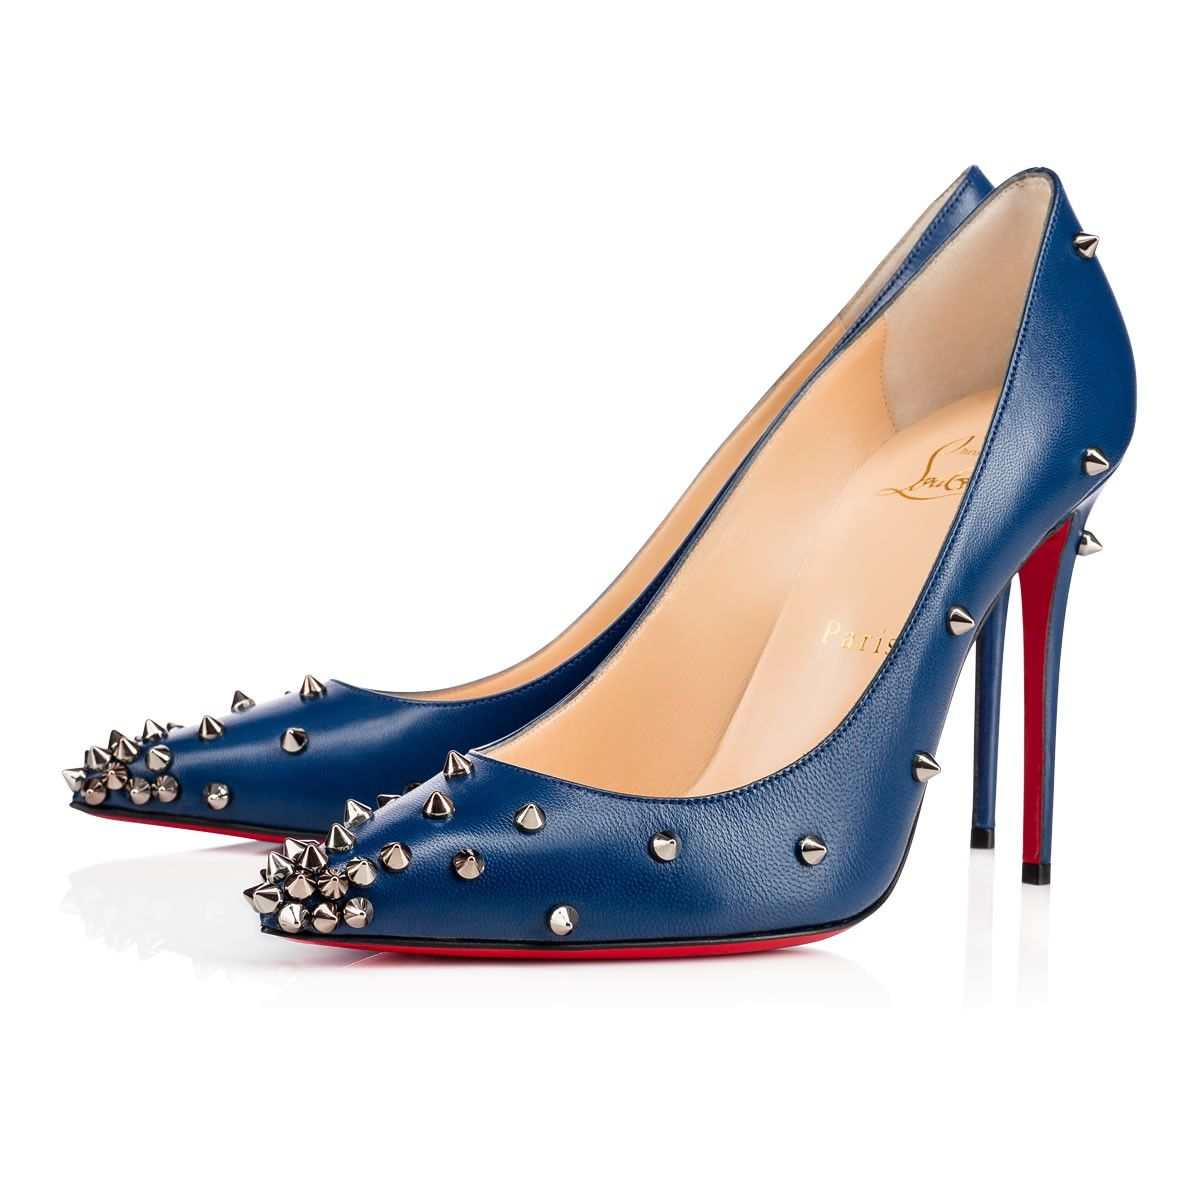 be48c9e9db09 CHRISTIAN LOUBOUTIN Degraspike 100Mm Espadon Leather.  christianlouboutin   shoes